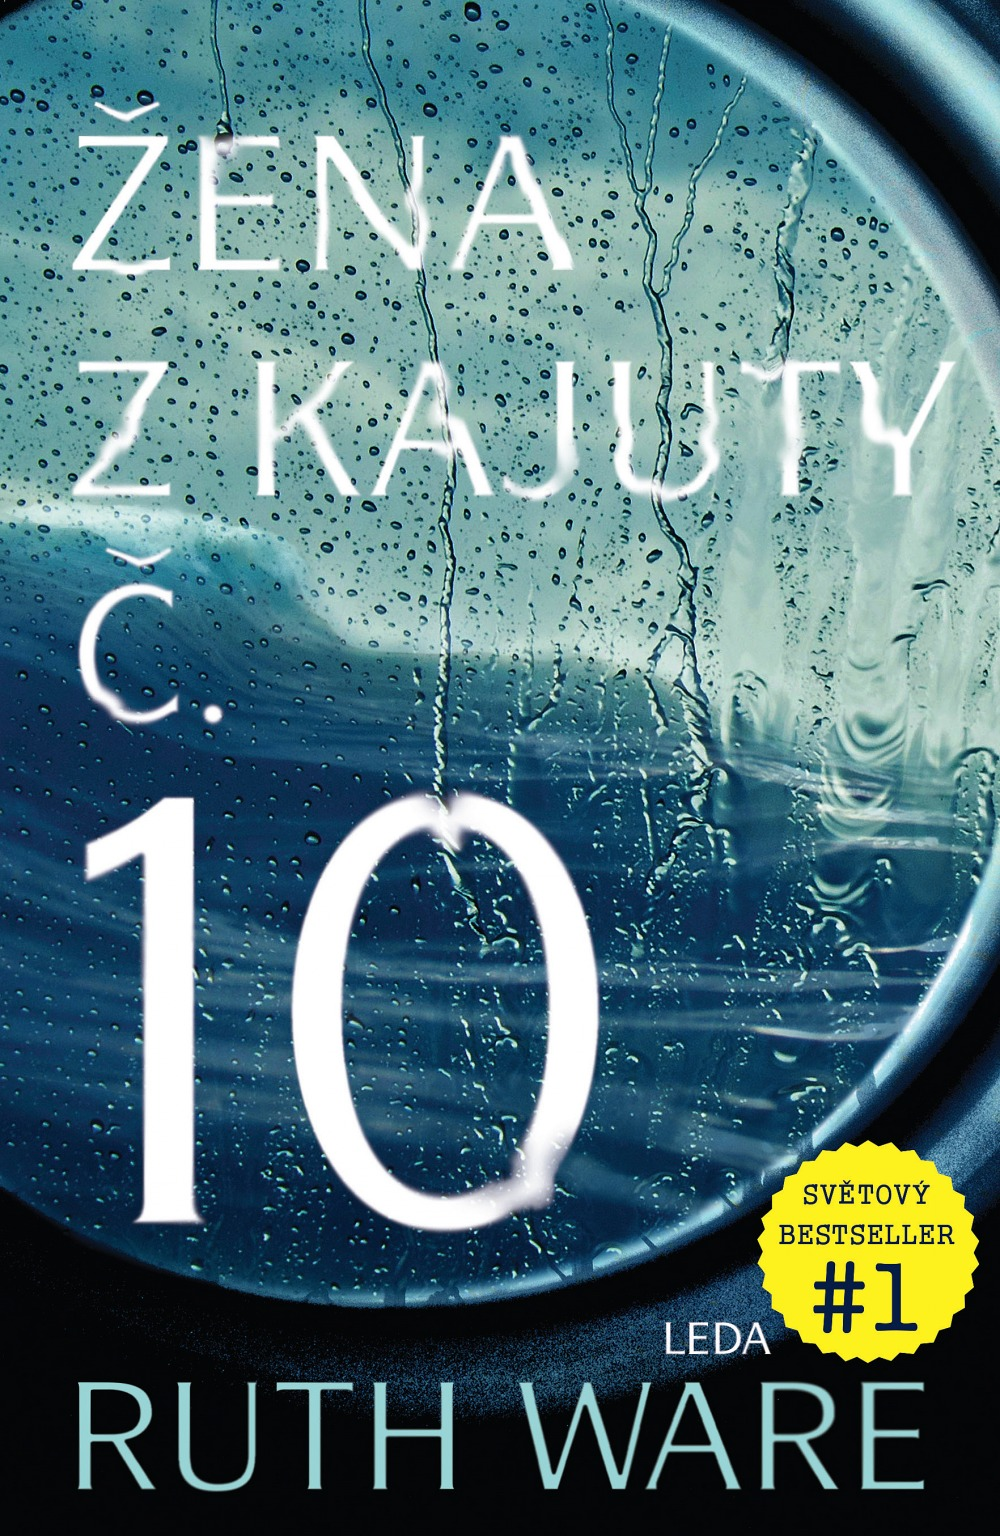 big_zena-z-kajuty-c-10-lvm-346480